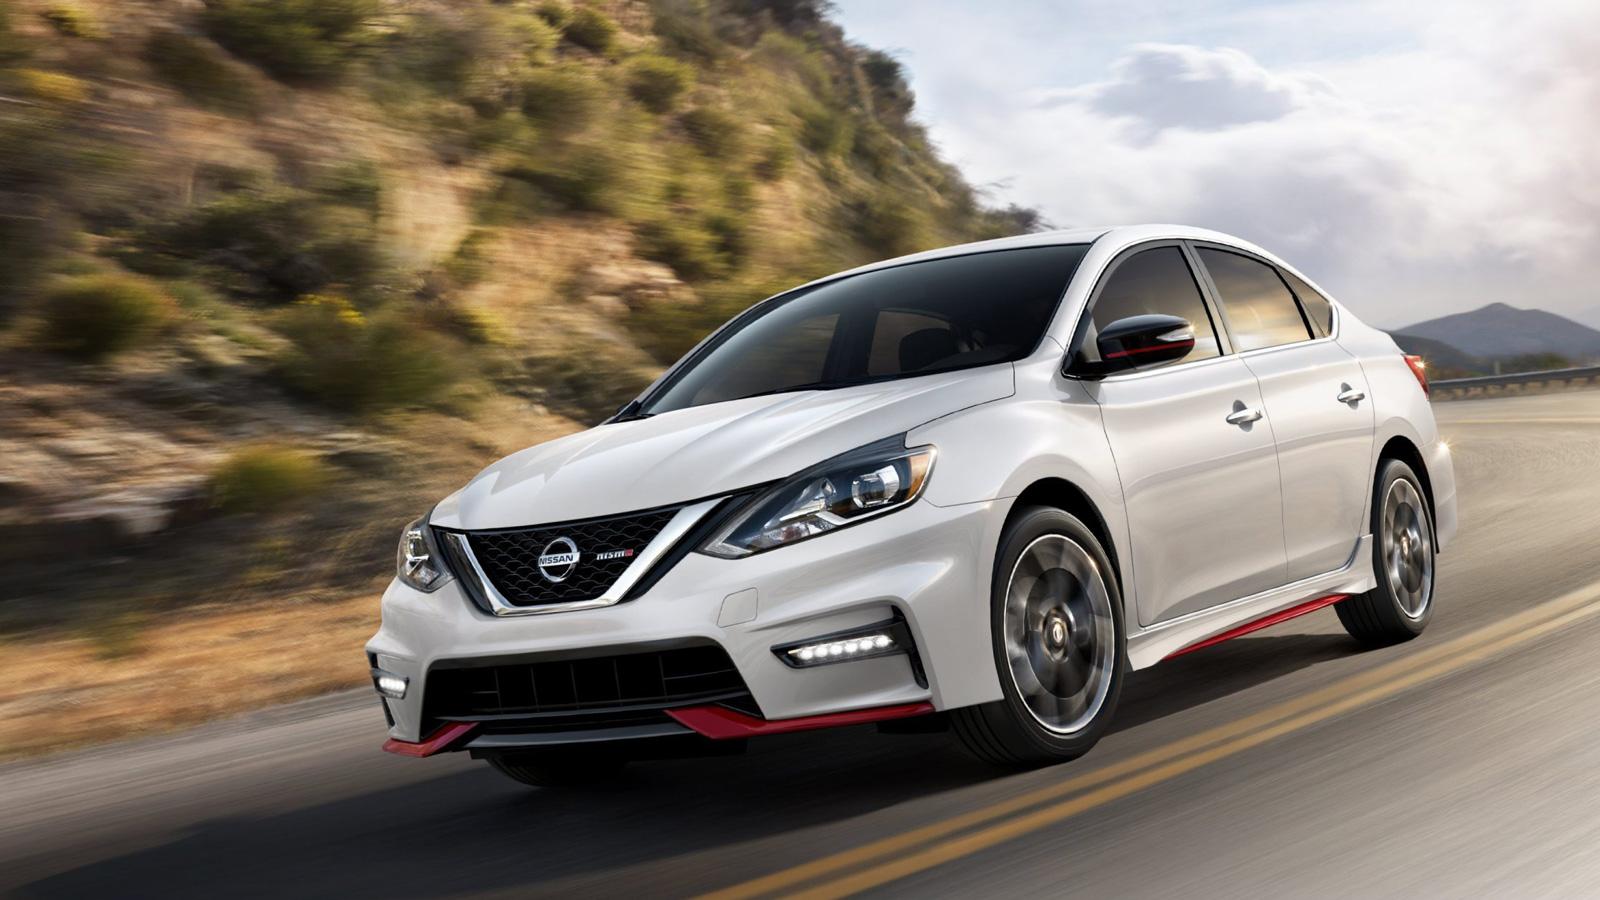 Peruzzi Nissan Blog - Peruzzi Nissan Blog | News, Updates, and Info